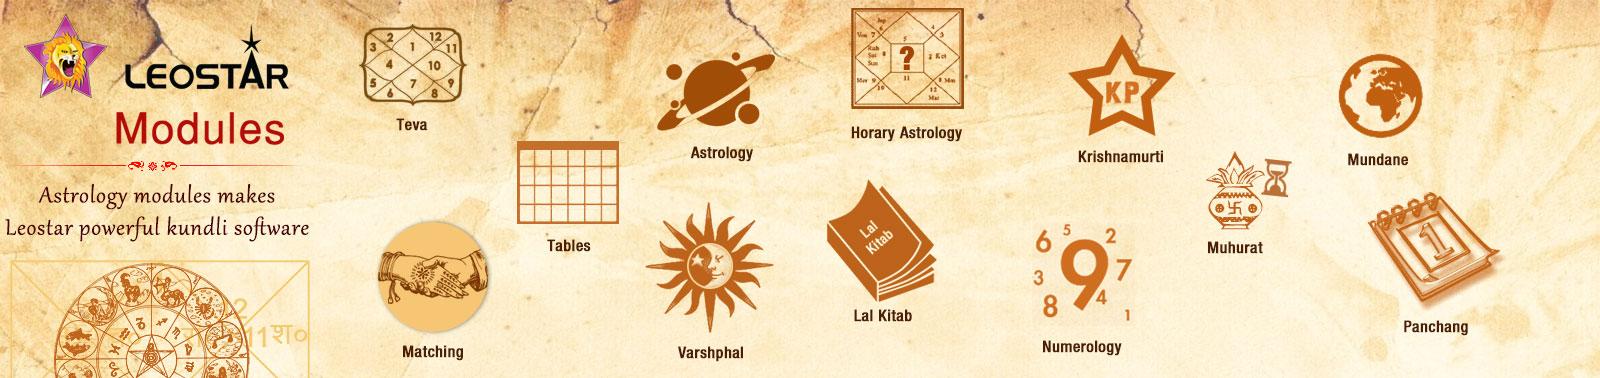 Astrology software modules